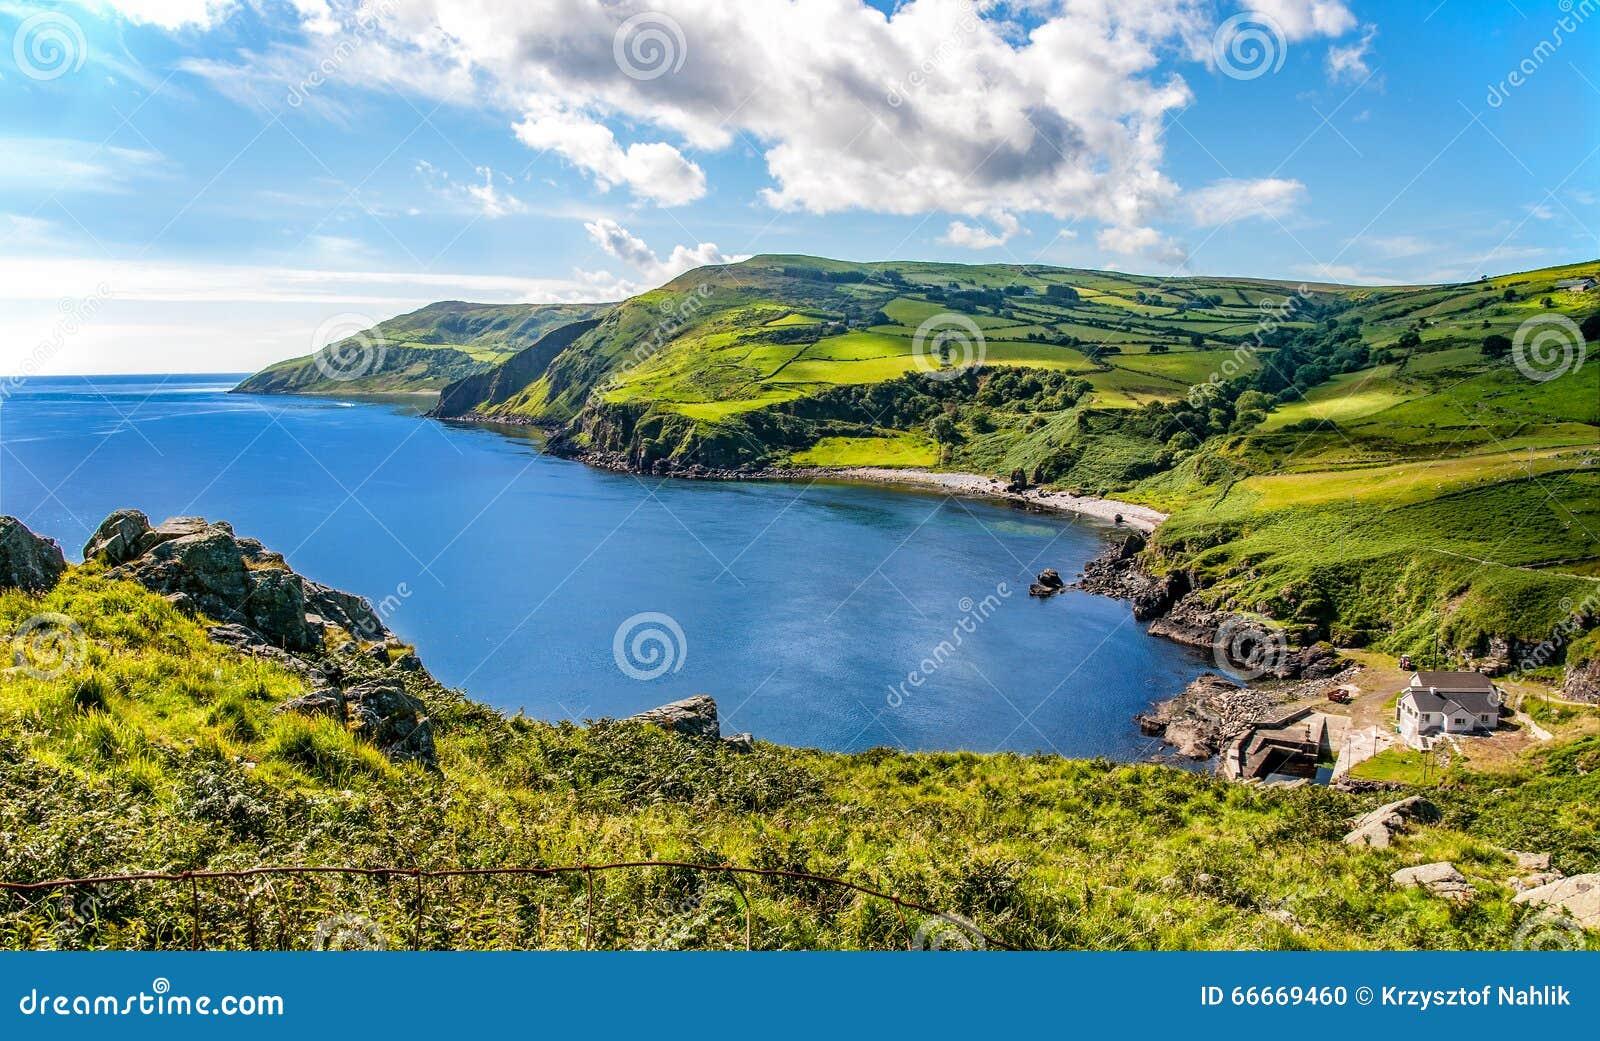 Northern coast of County Antrim, Northern Ireland